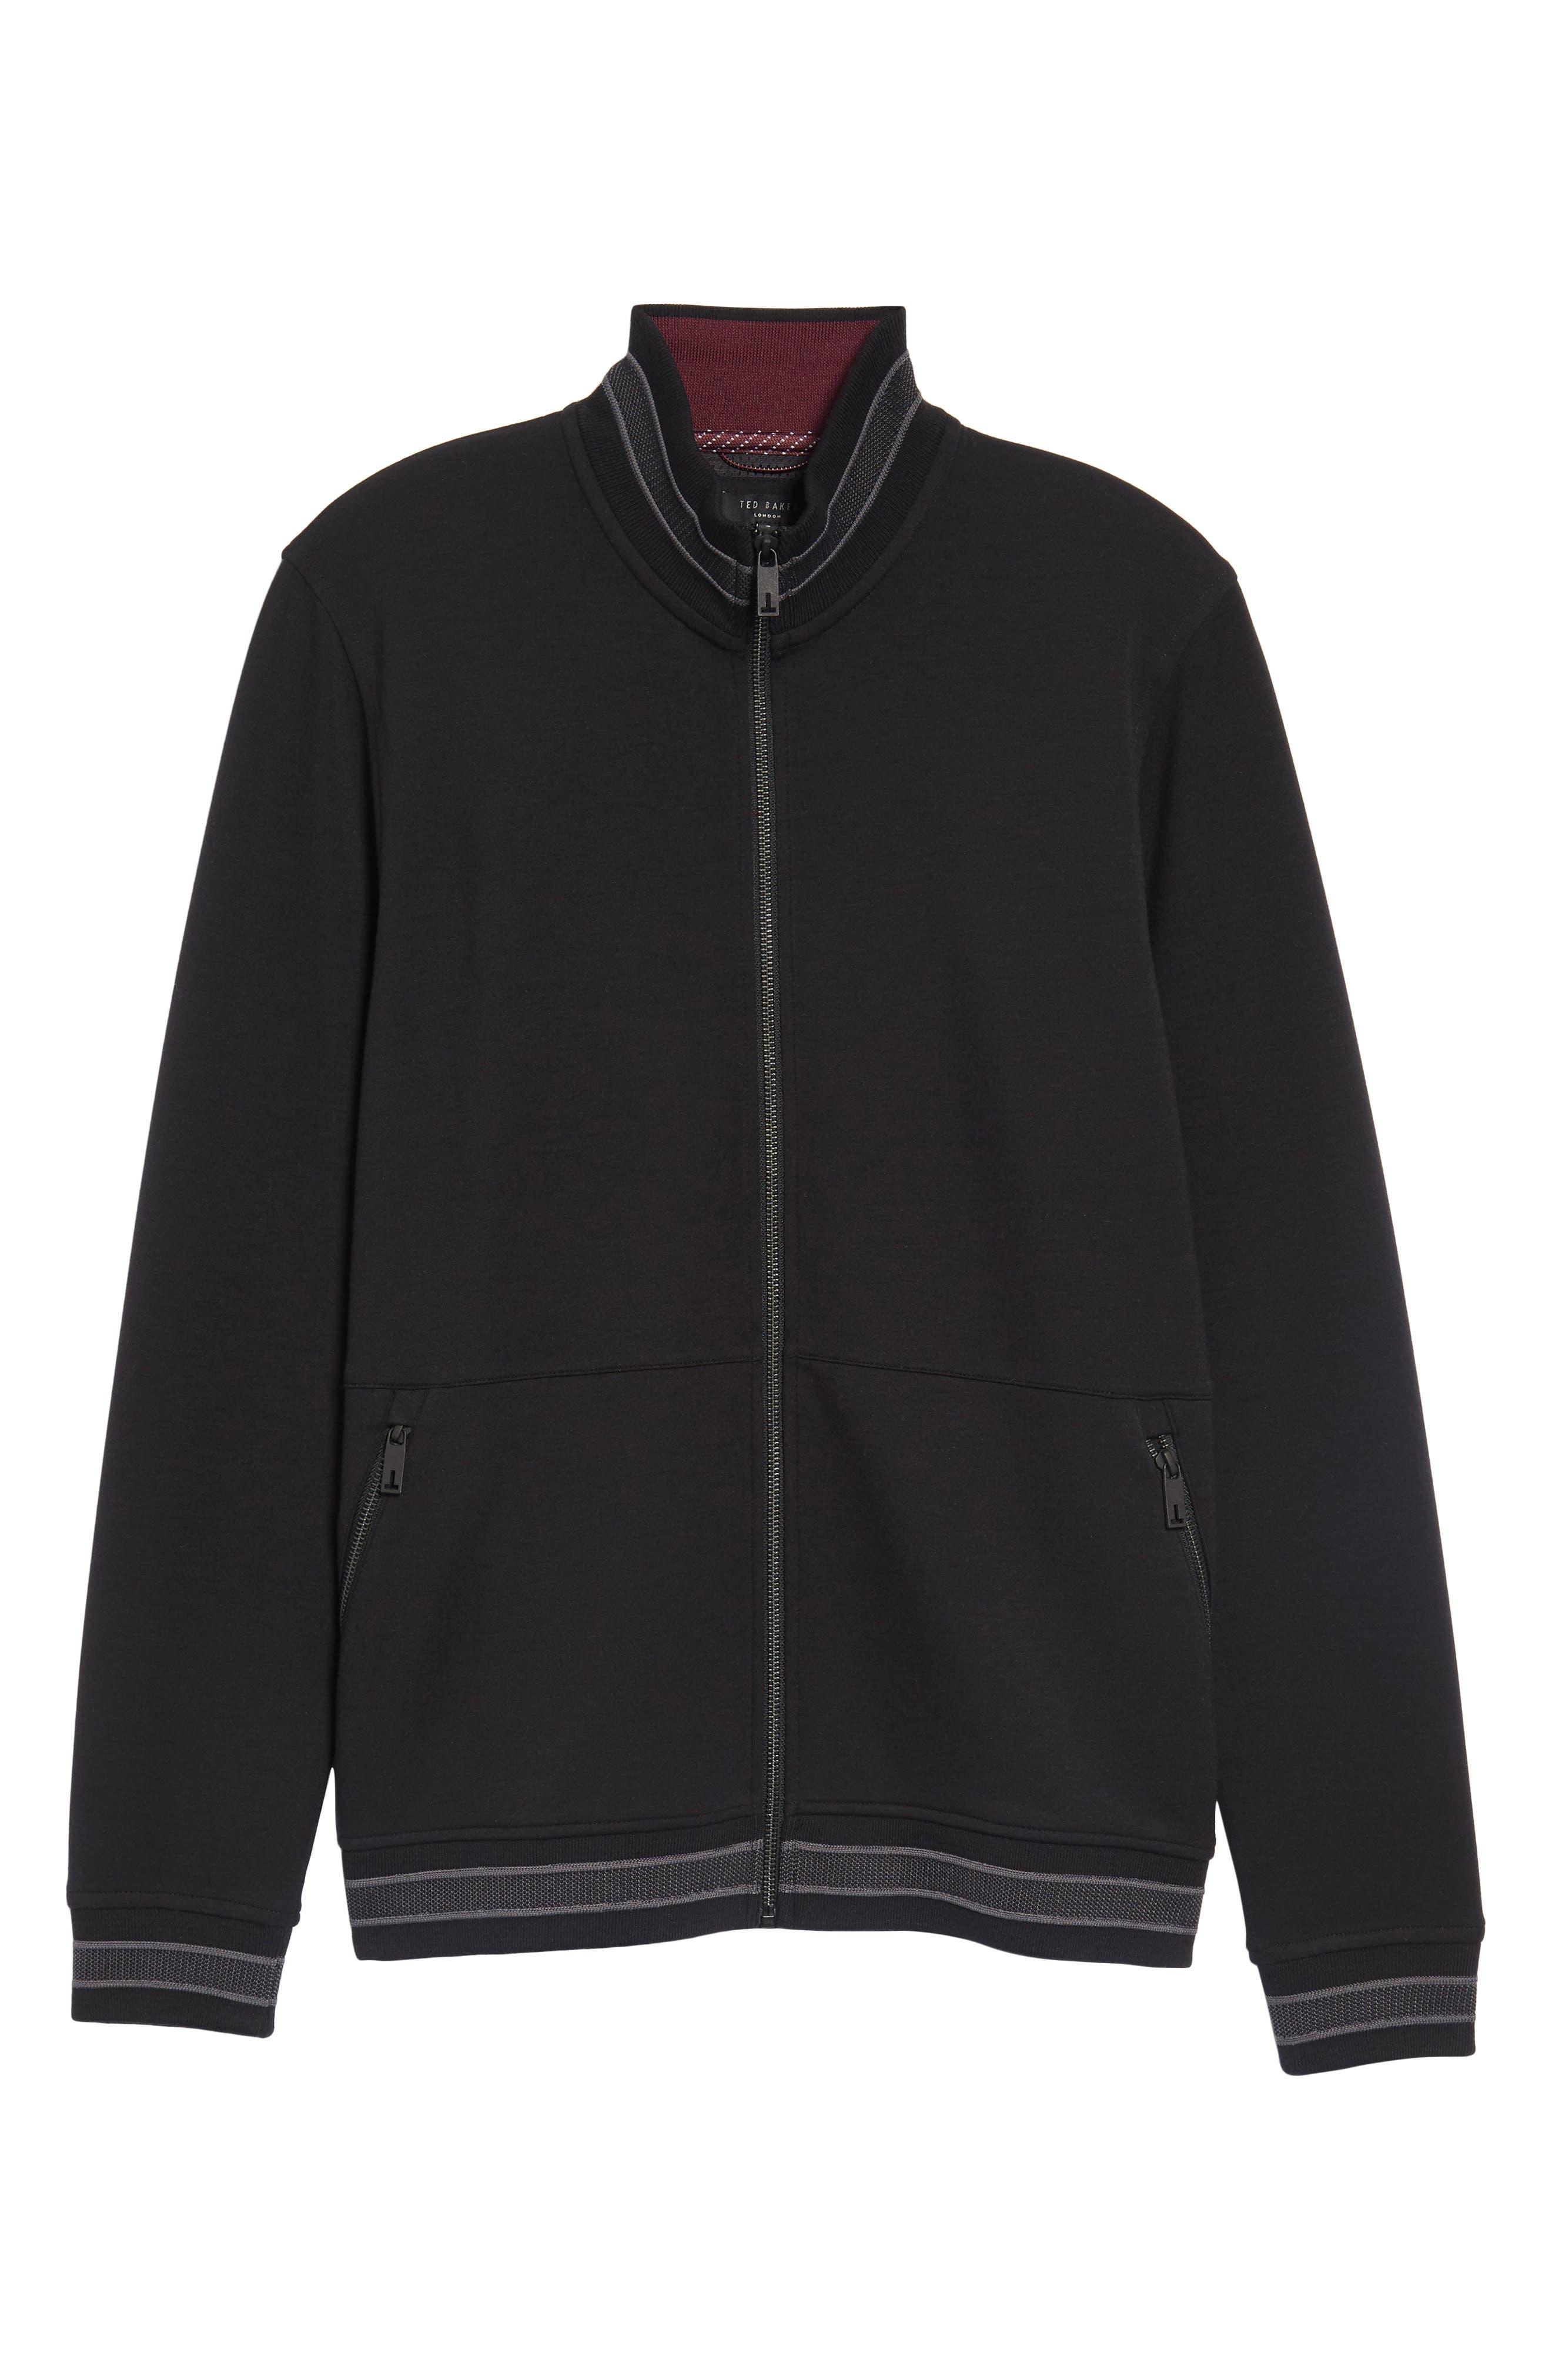 Collie Jersey Zip Jacket,                             Alternate thumbnail 6, color,                             001